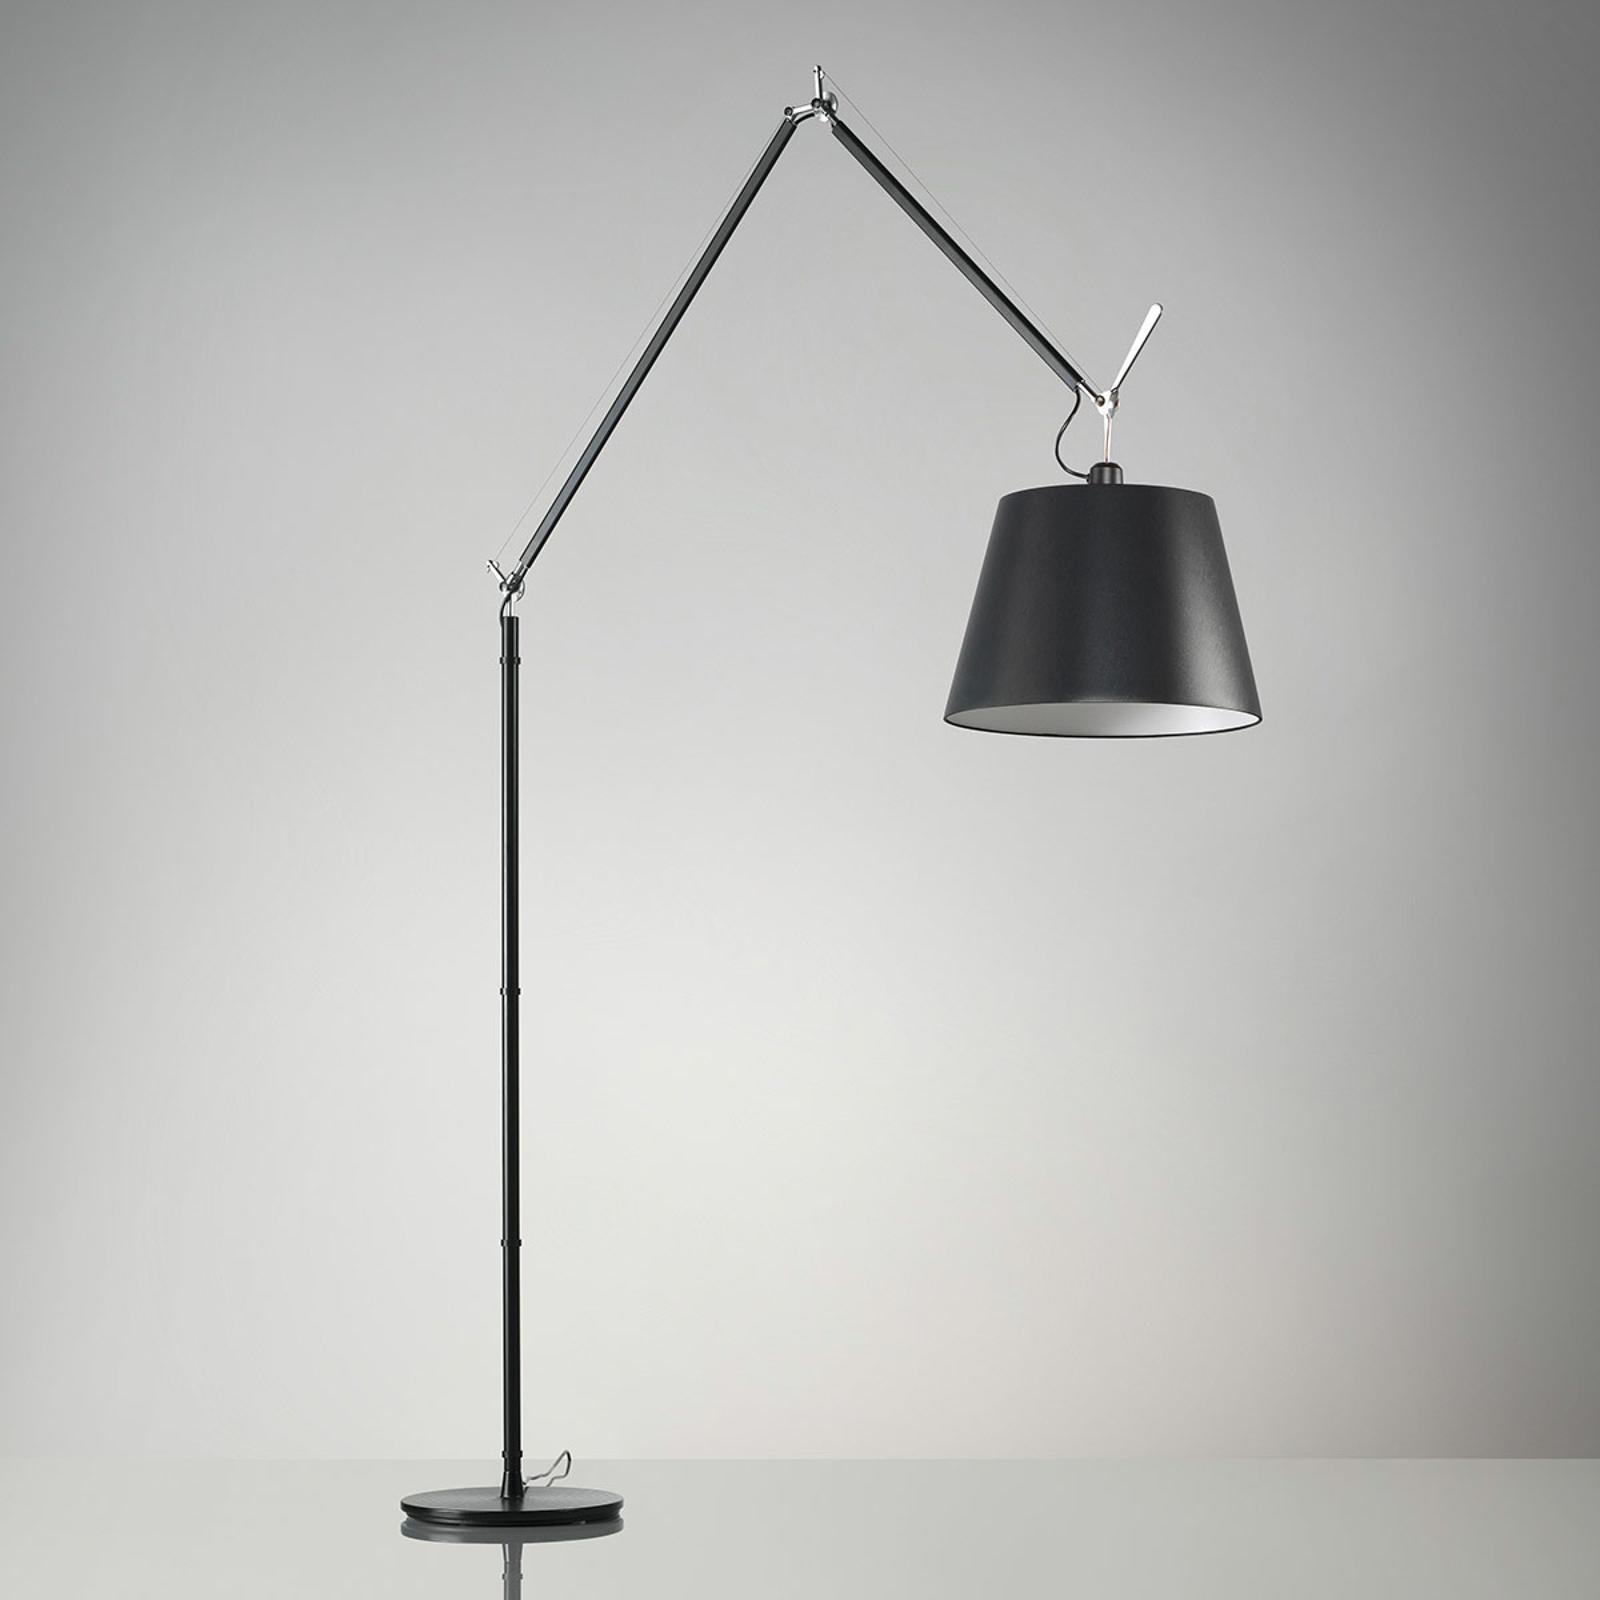 Artemide Tolomeo Mega lampadaire 2700K Ø 32cm